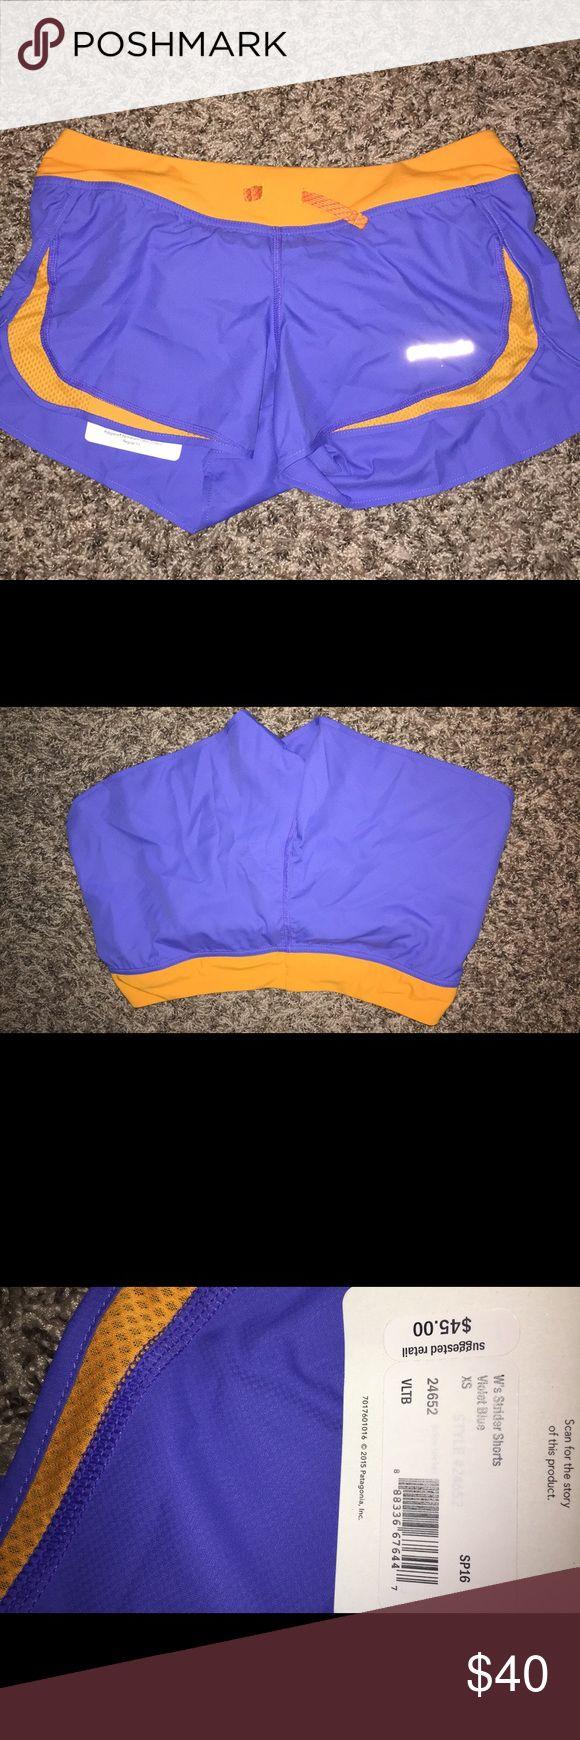 Patagonia women's shorts Brand new never worn! Purple & orange Patagonia Shorts